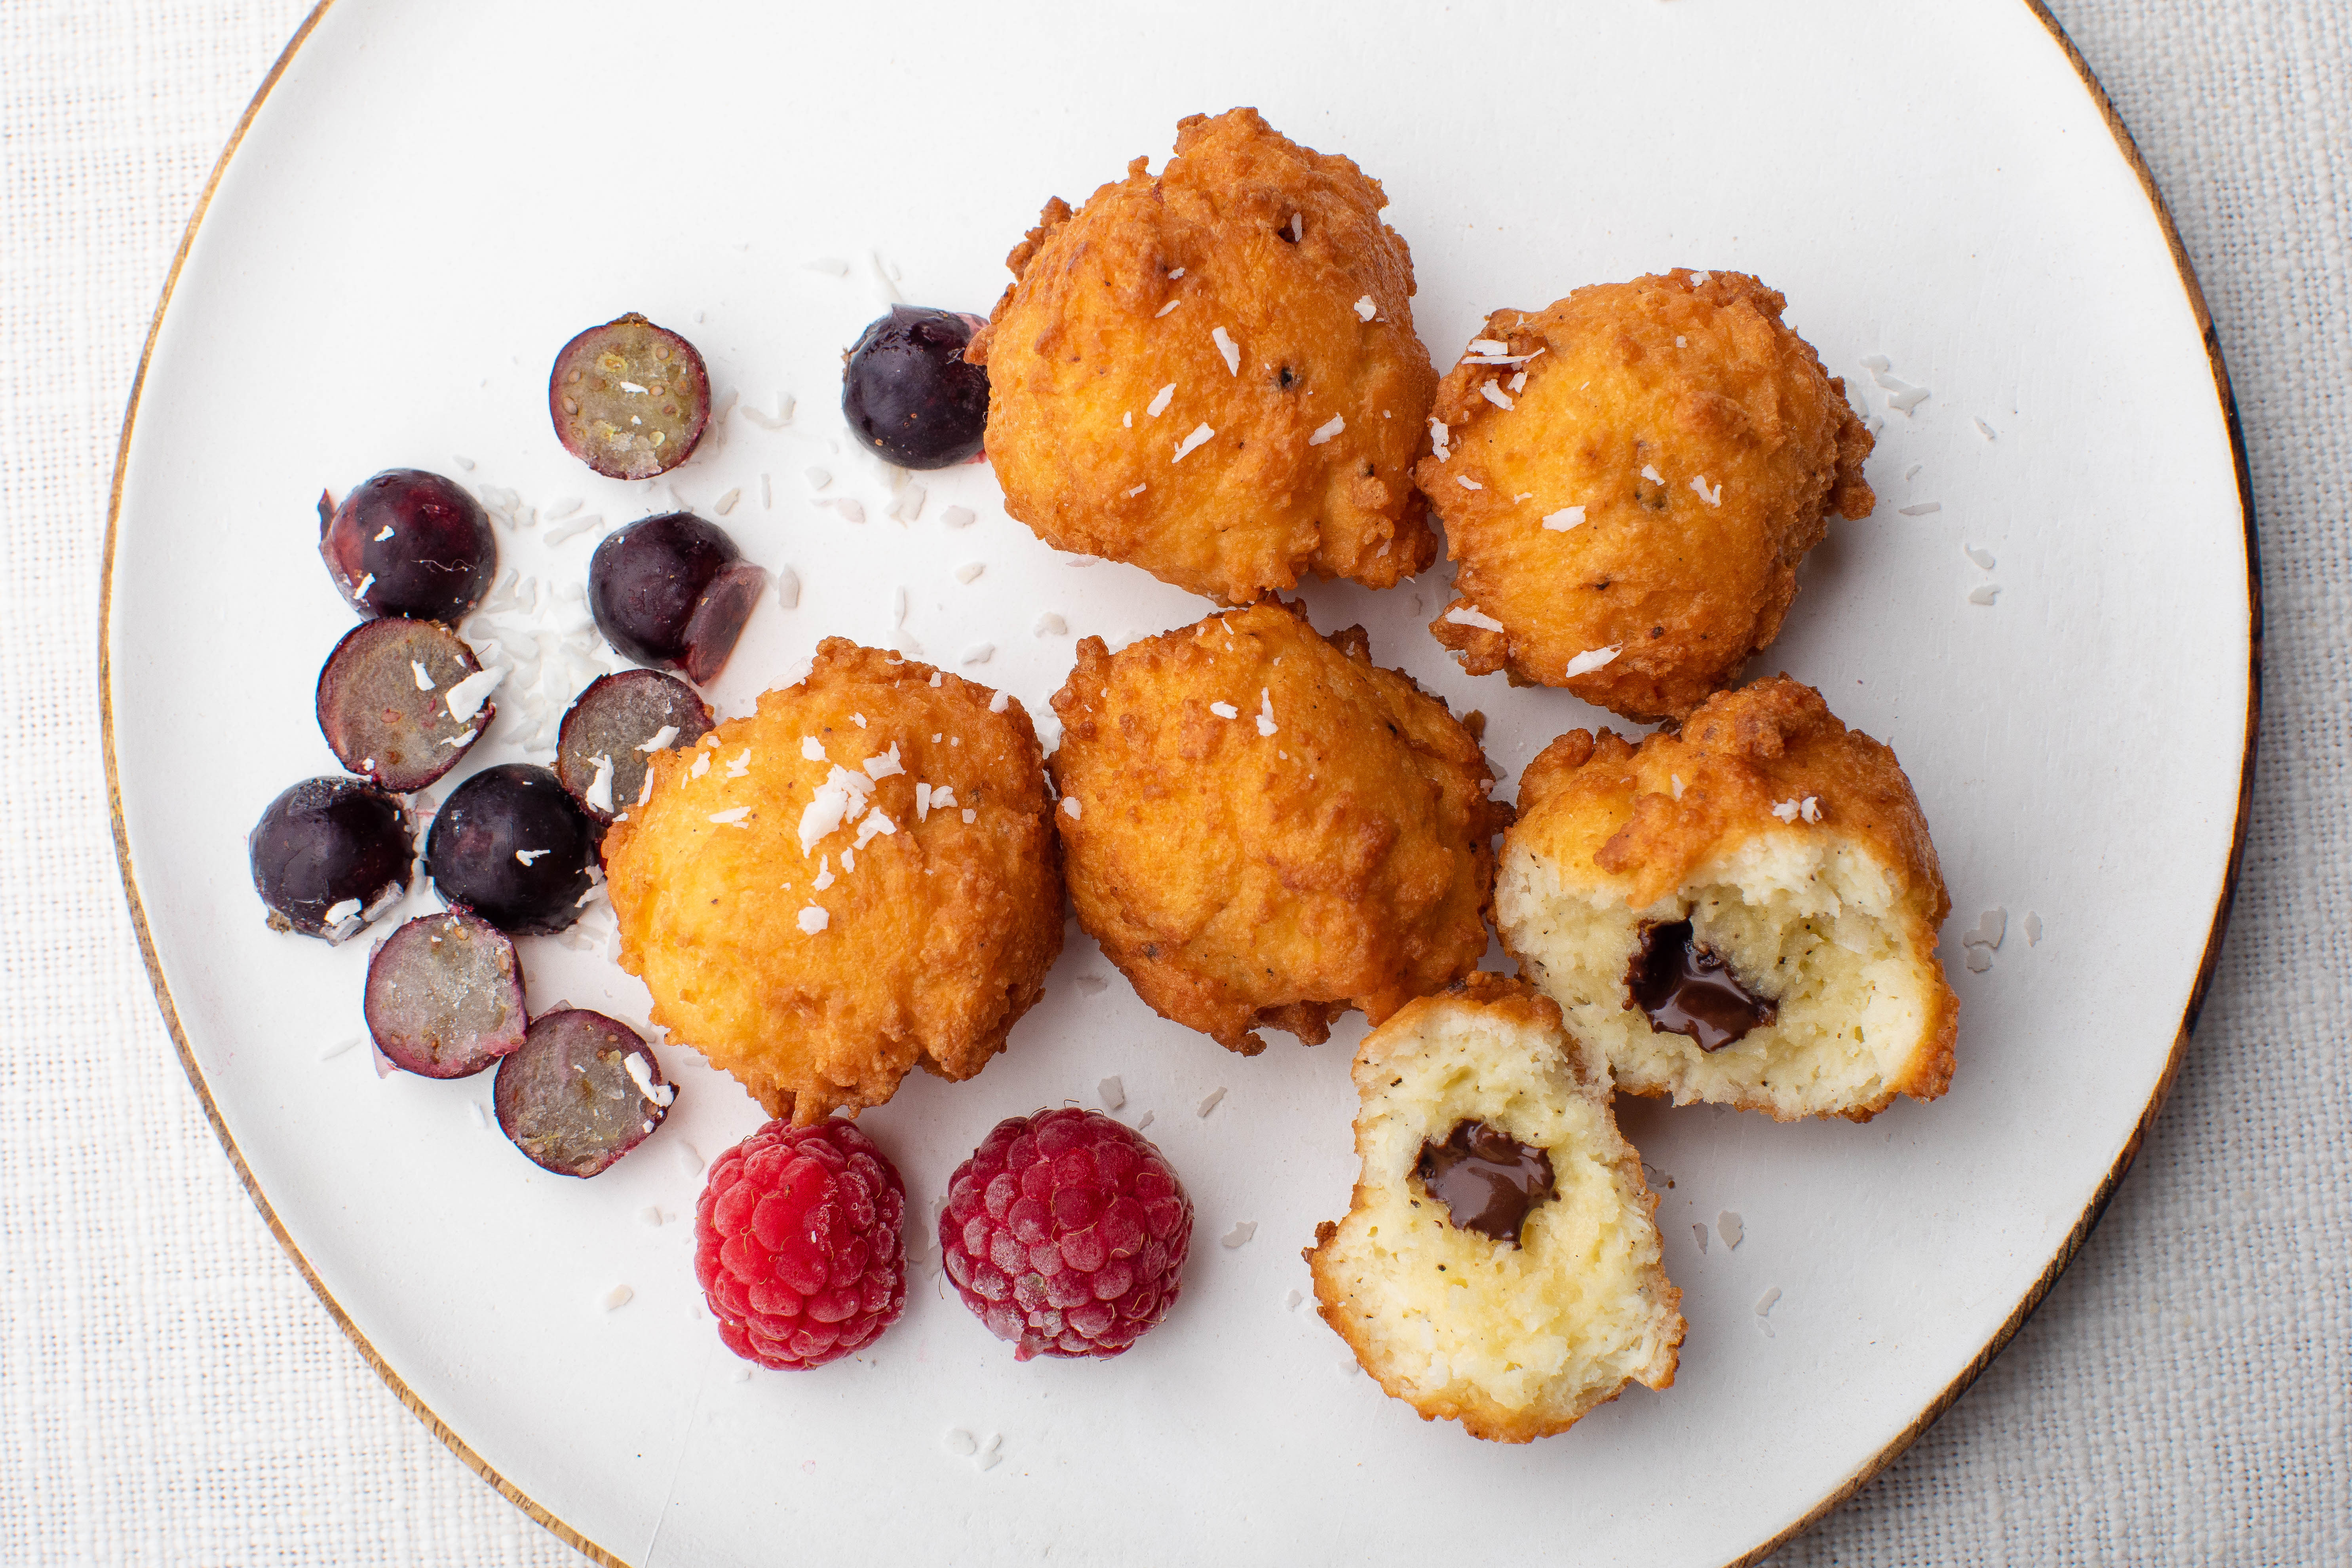 Fried keto coconut puffs